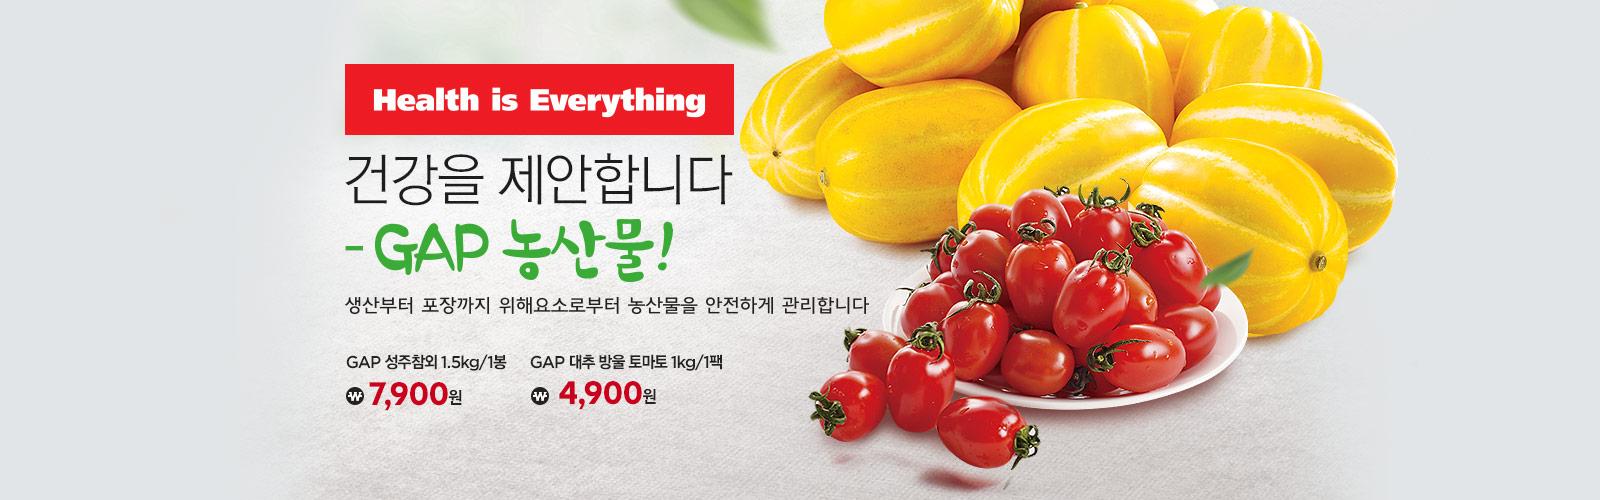 Health is Everything 건강을 제안합니다!   -GAP 농산물!   생산부터 포장까지 위해요소로부터 농산물을 안전하게 관리합니다. GAP 성주참외 1.5kg /1봉  7,900원  GAP 대추 방울 토마토 1kg/1팩 4,900원